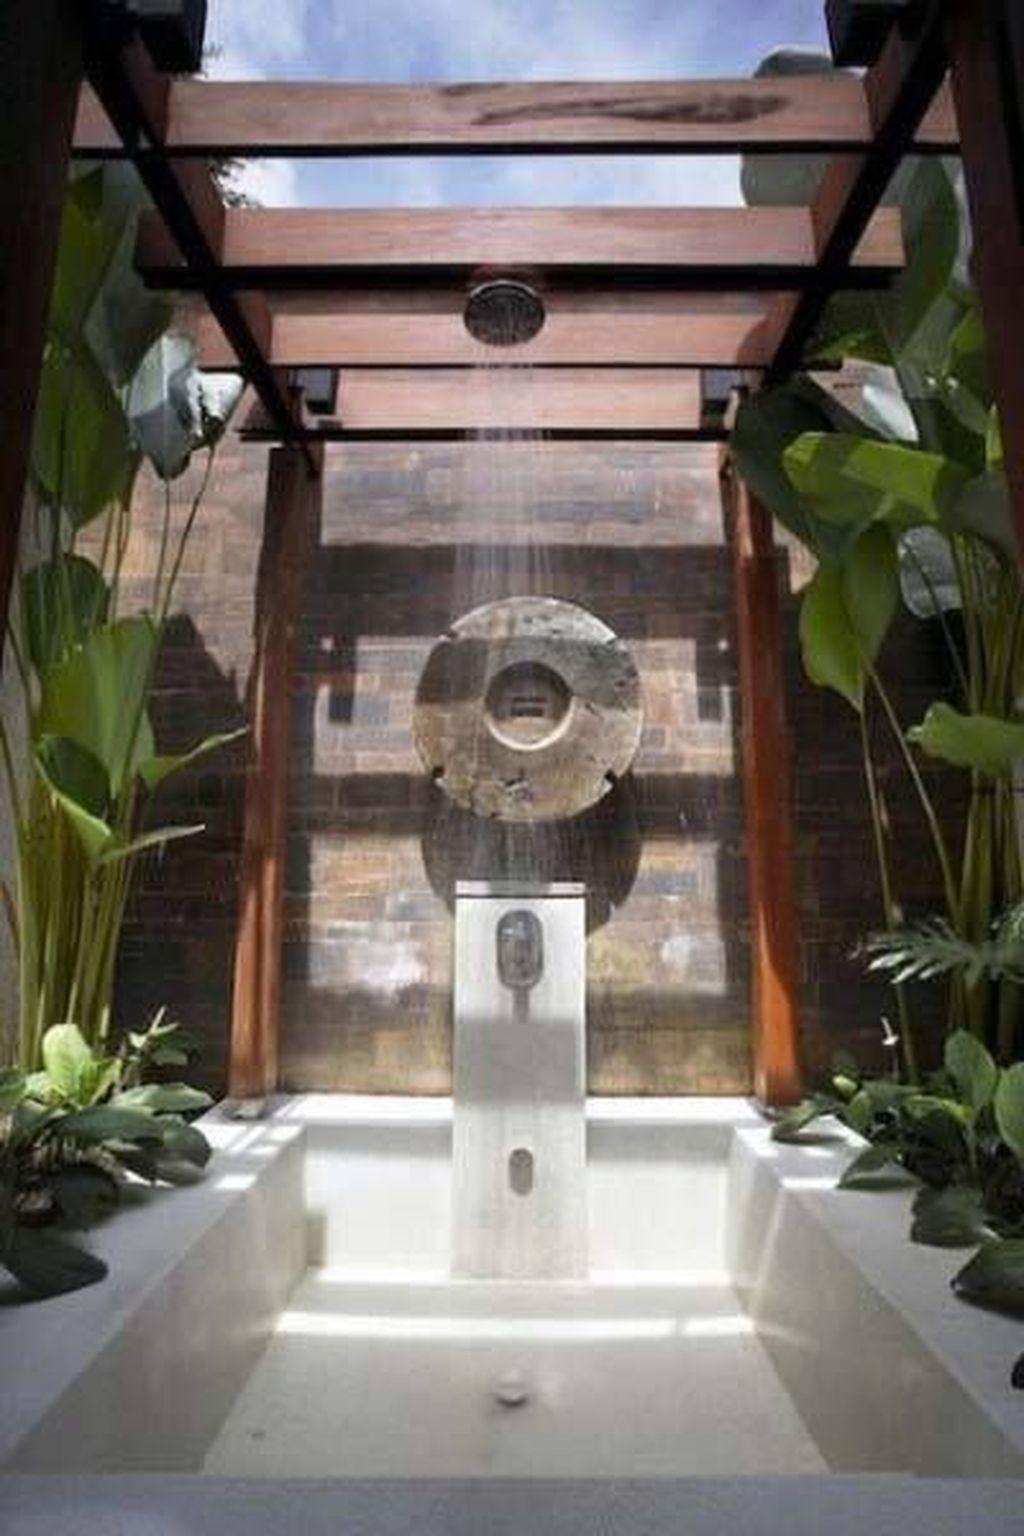 Creative Outdoor Bathroom Design Ideas For Enjoying Summer 18